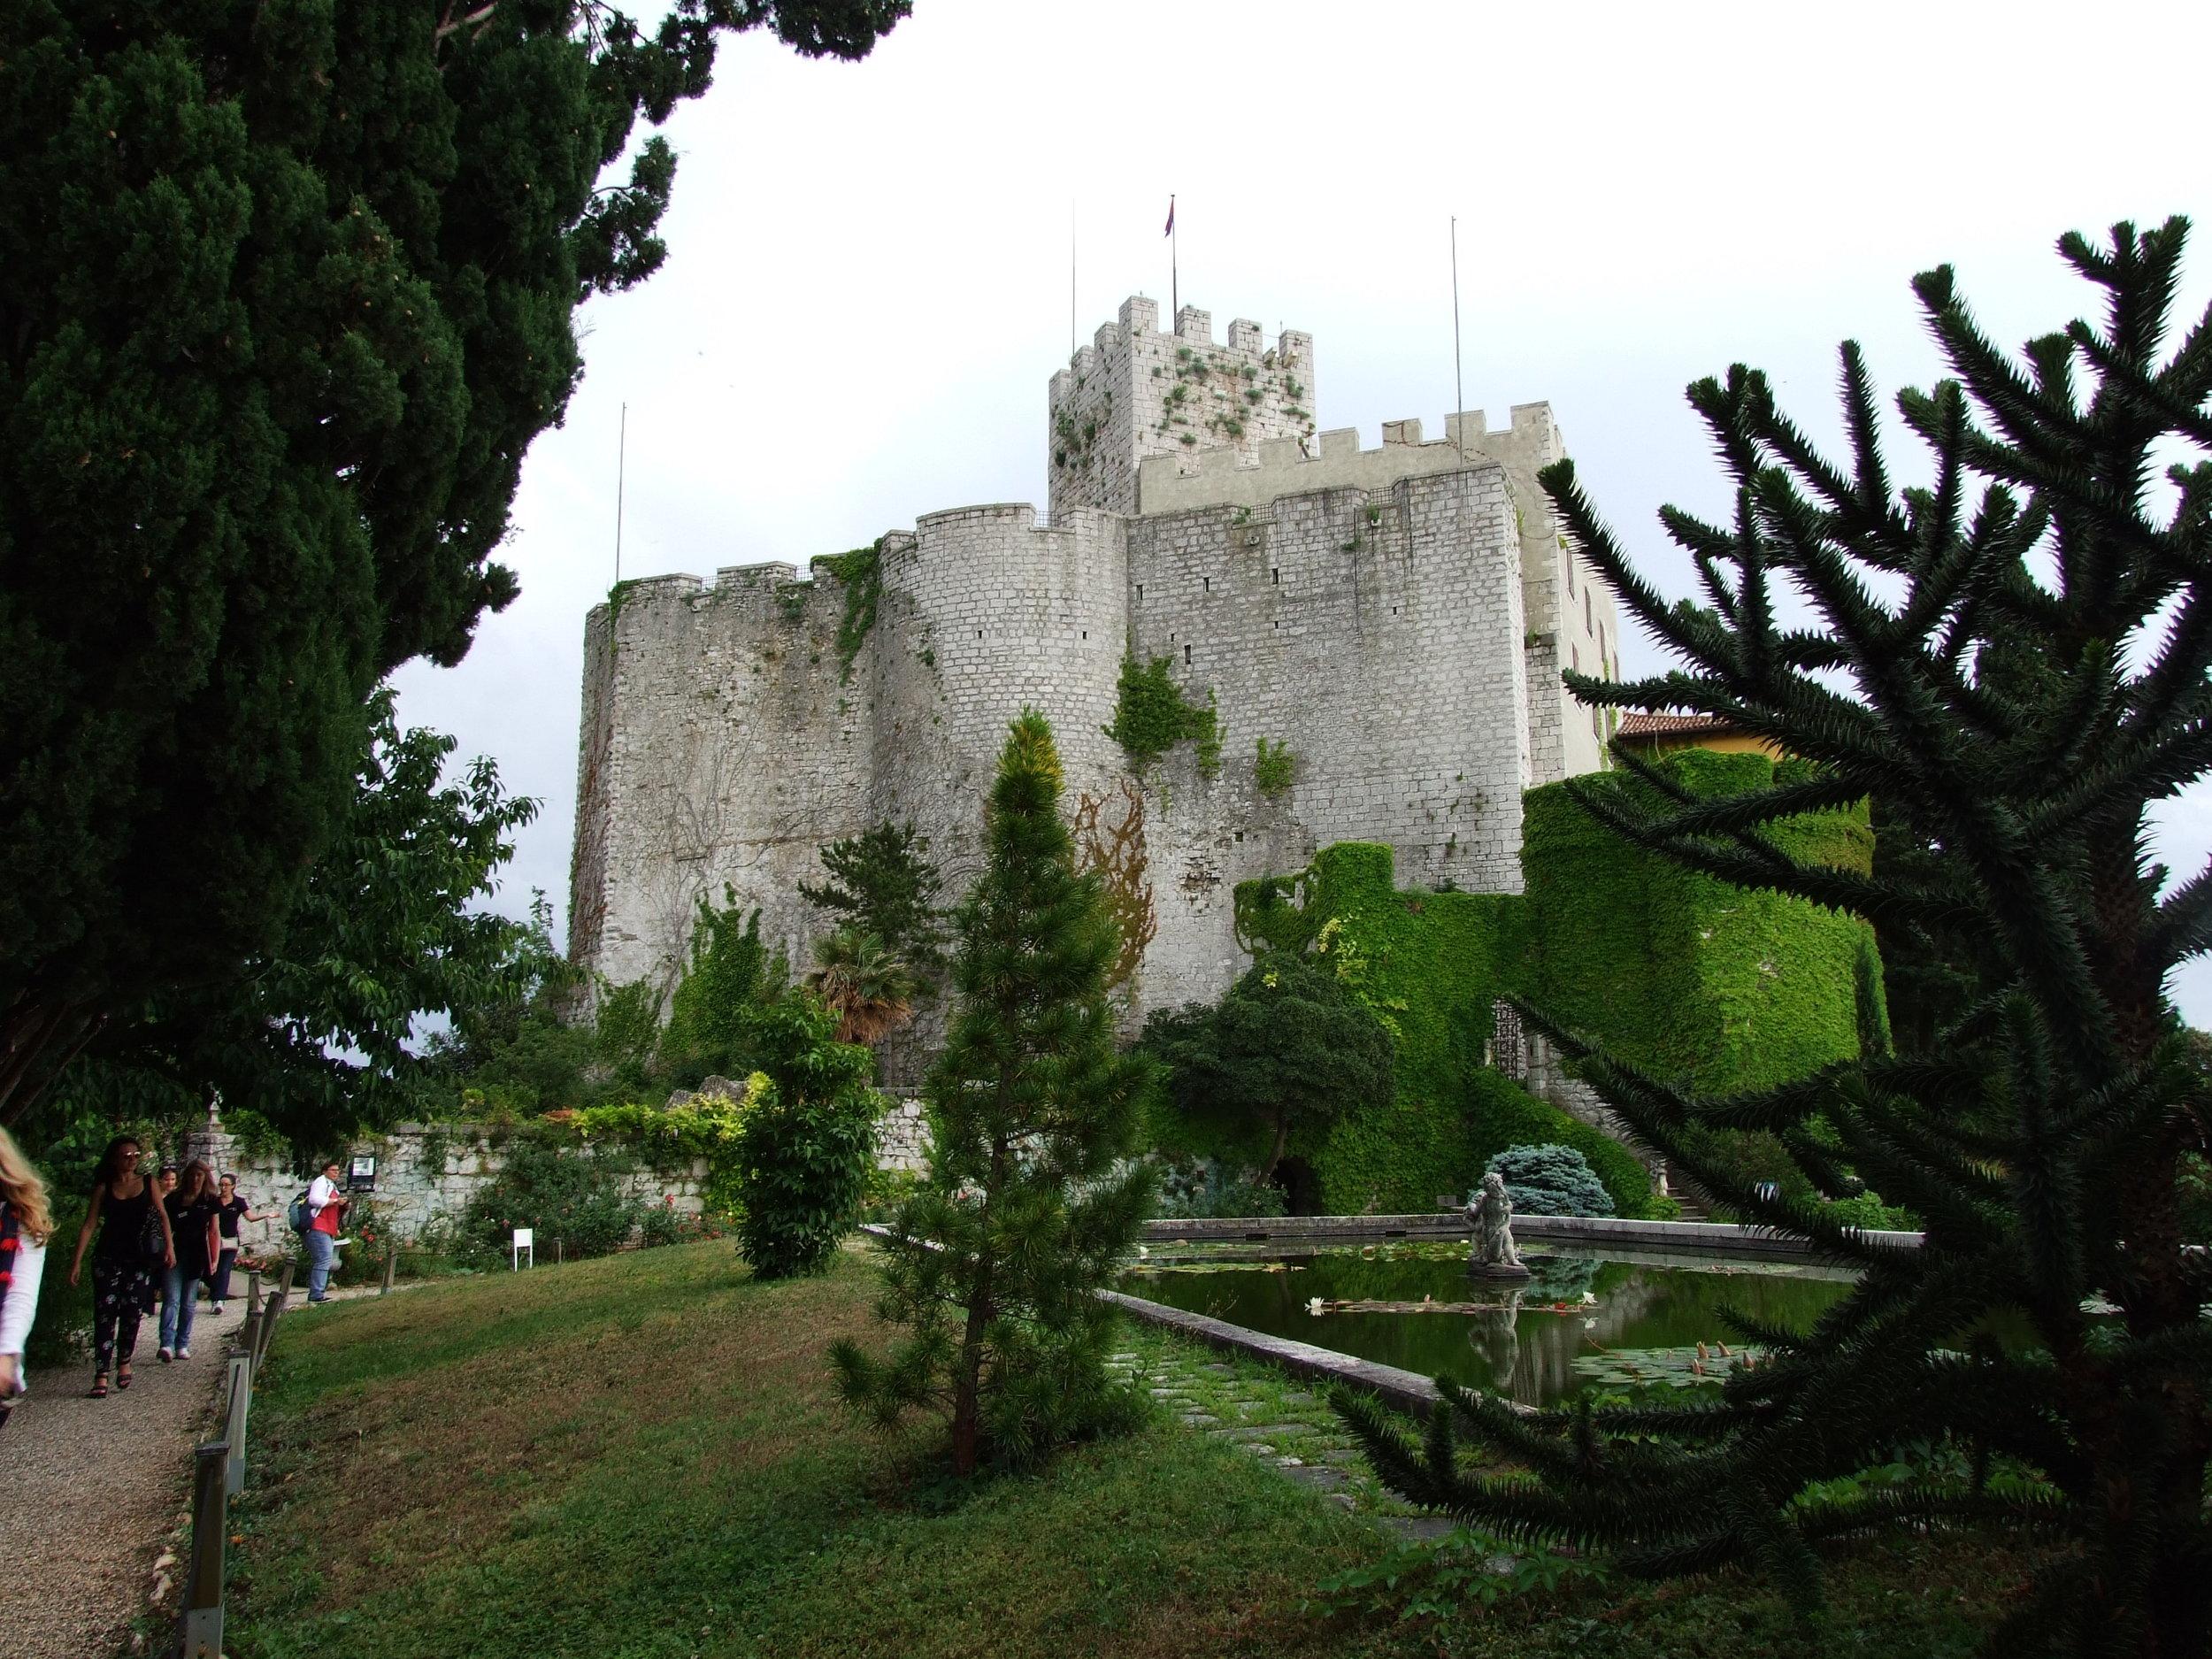 Castel + garden__04.JPG